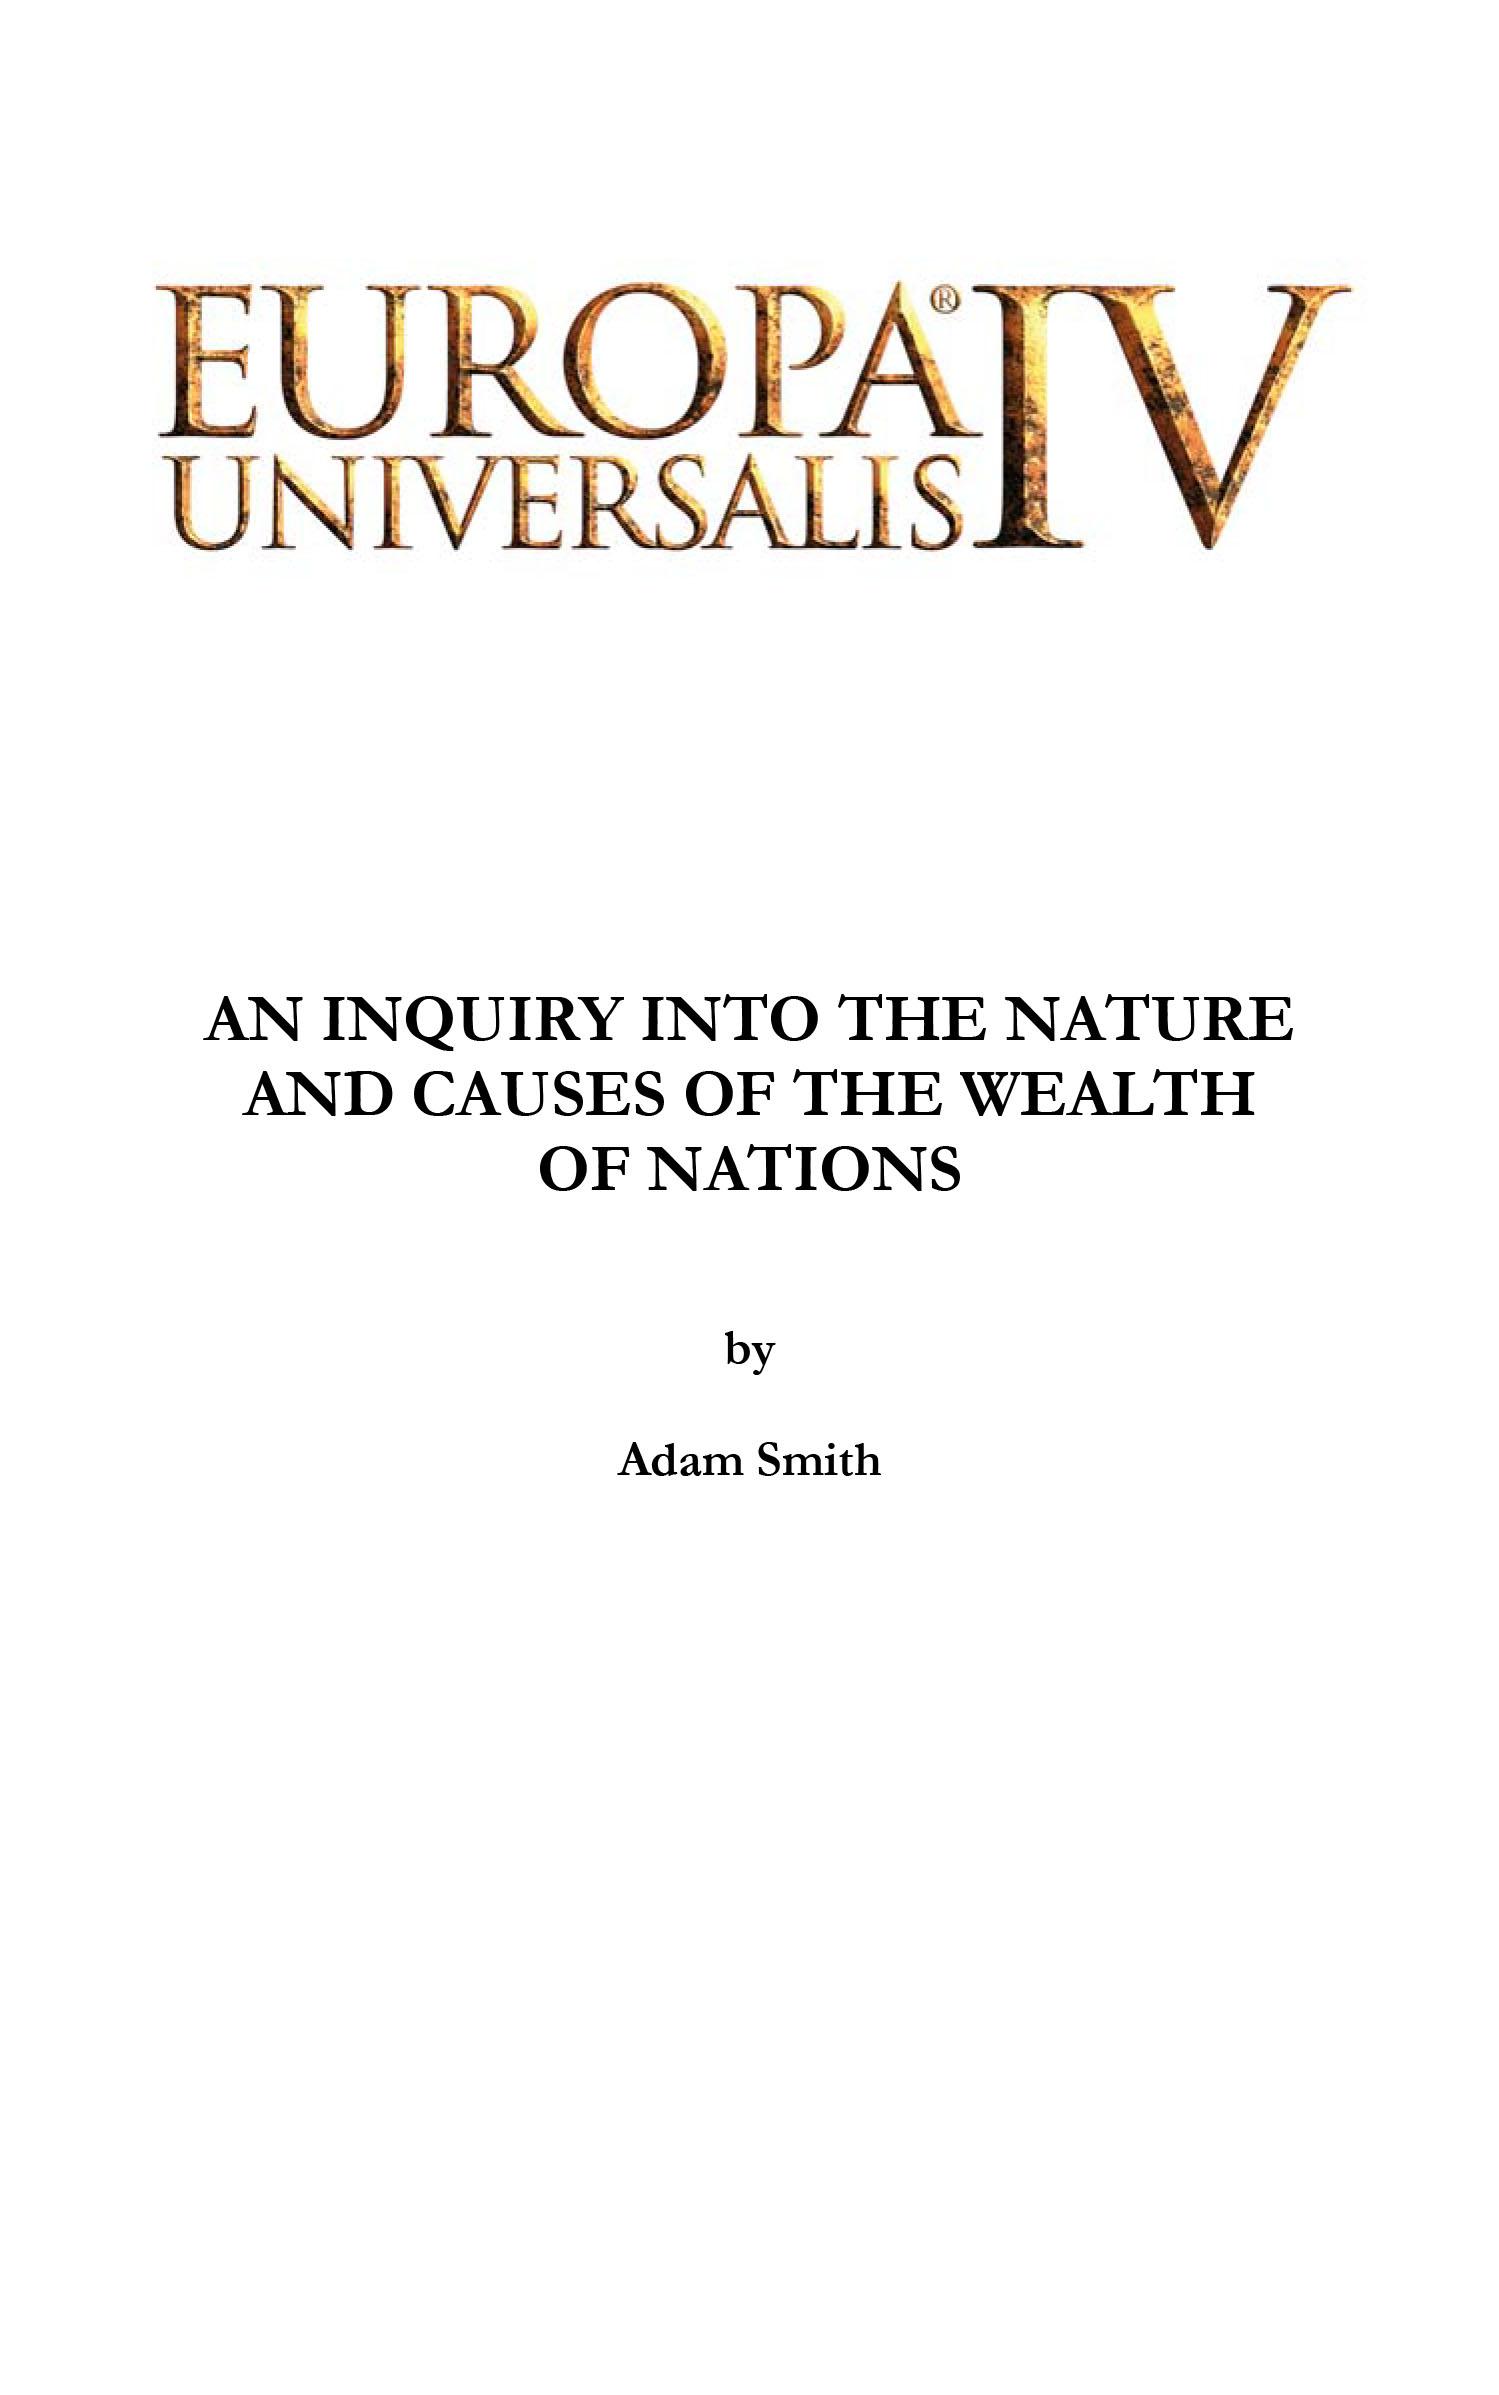 Europa Universalis IV: Wealth of Nations E-book screenshot